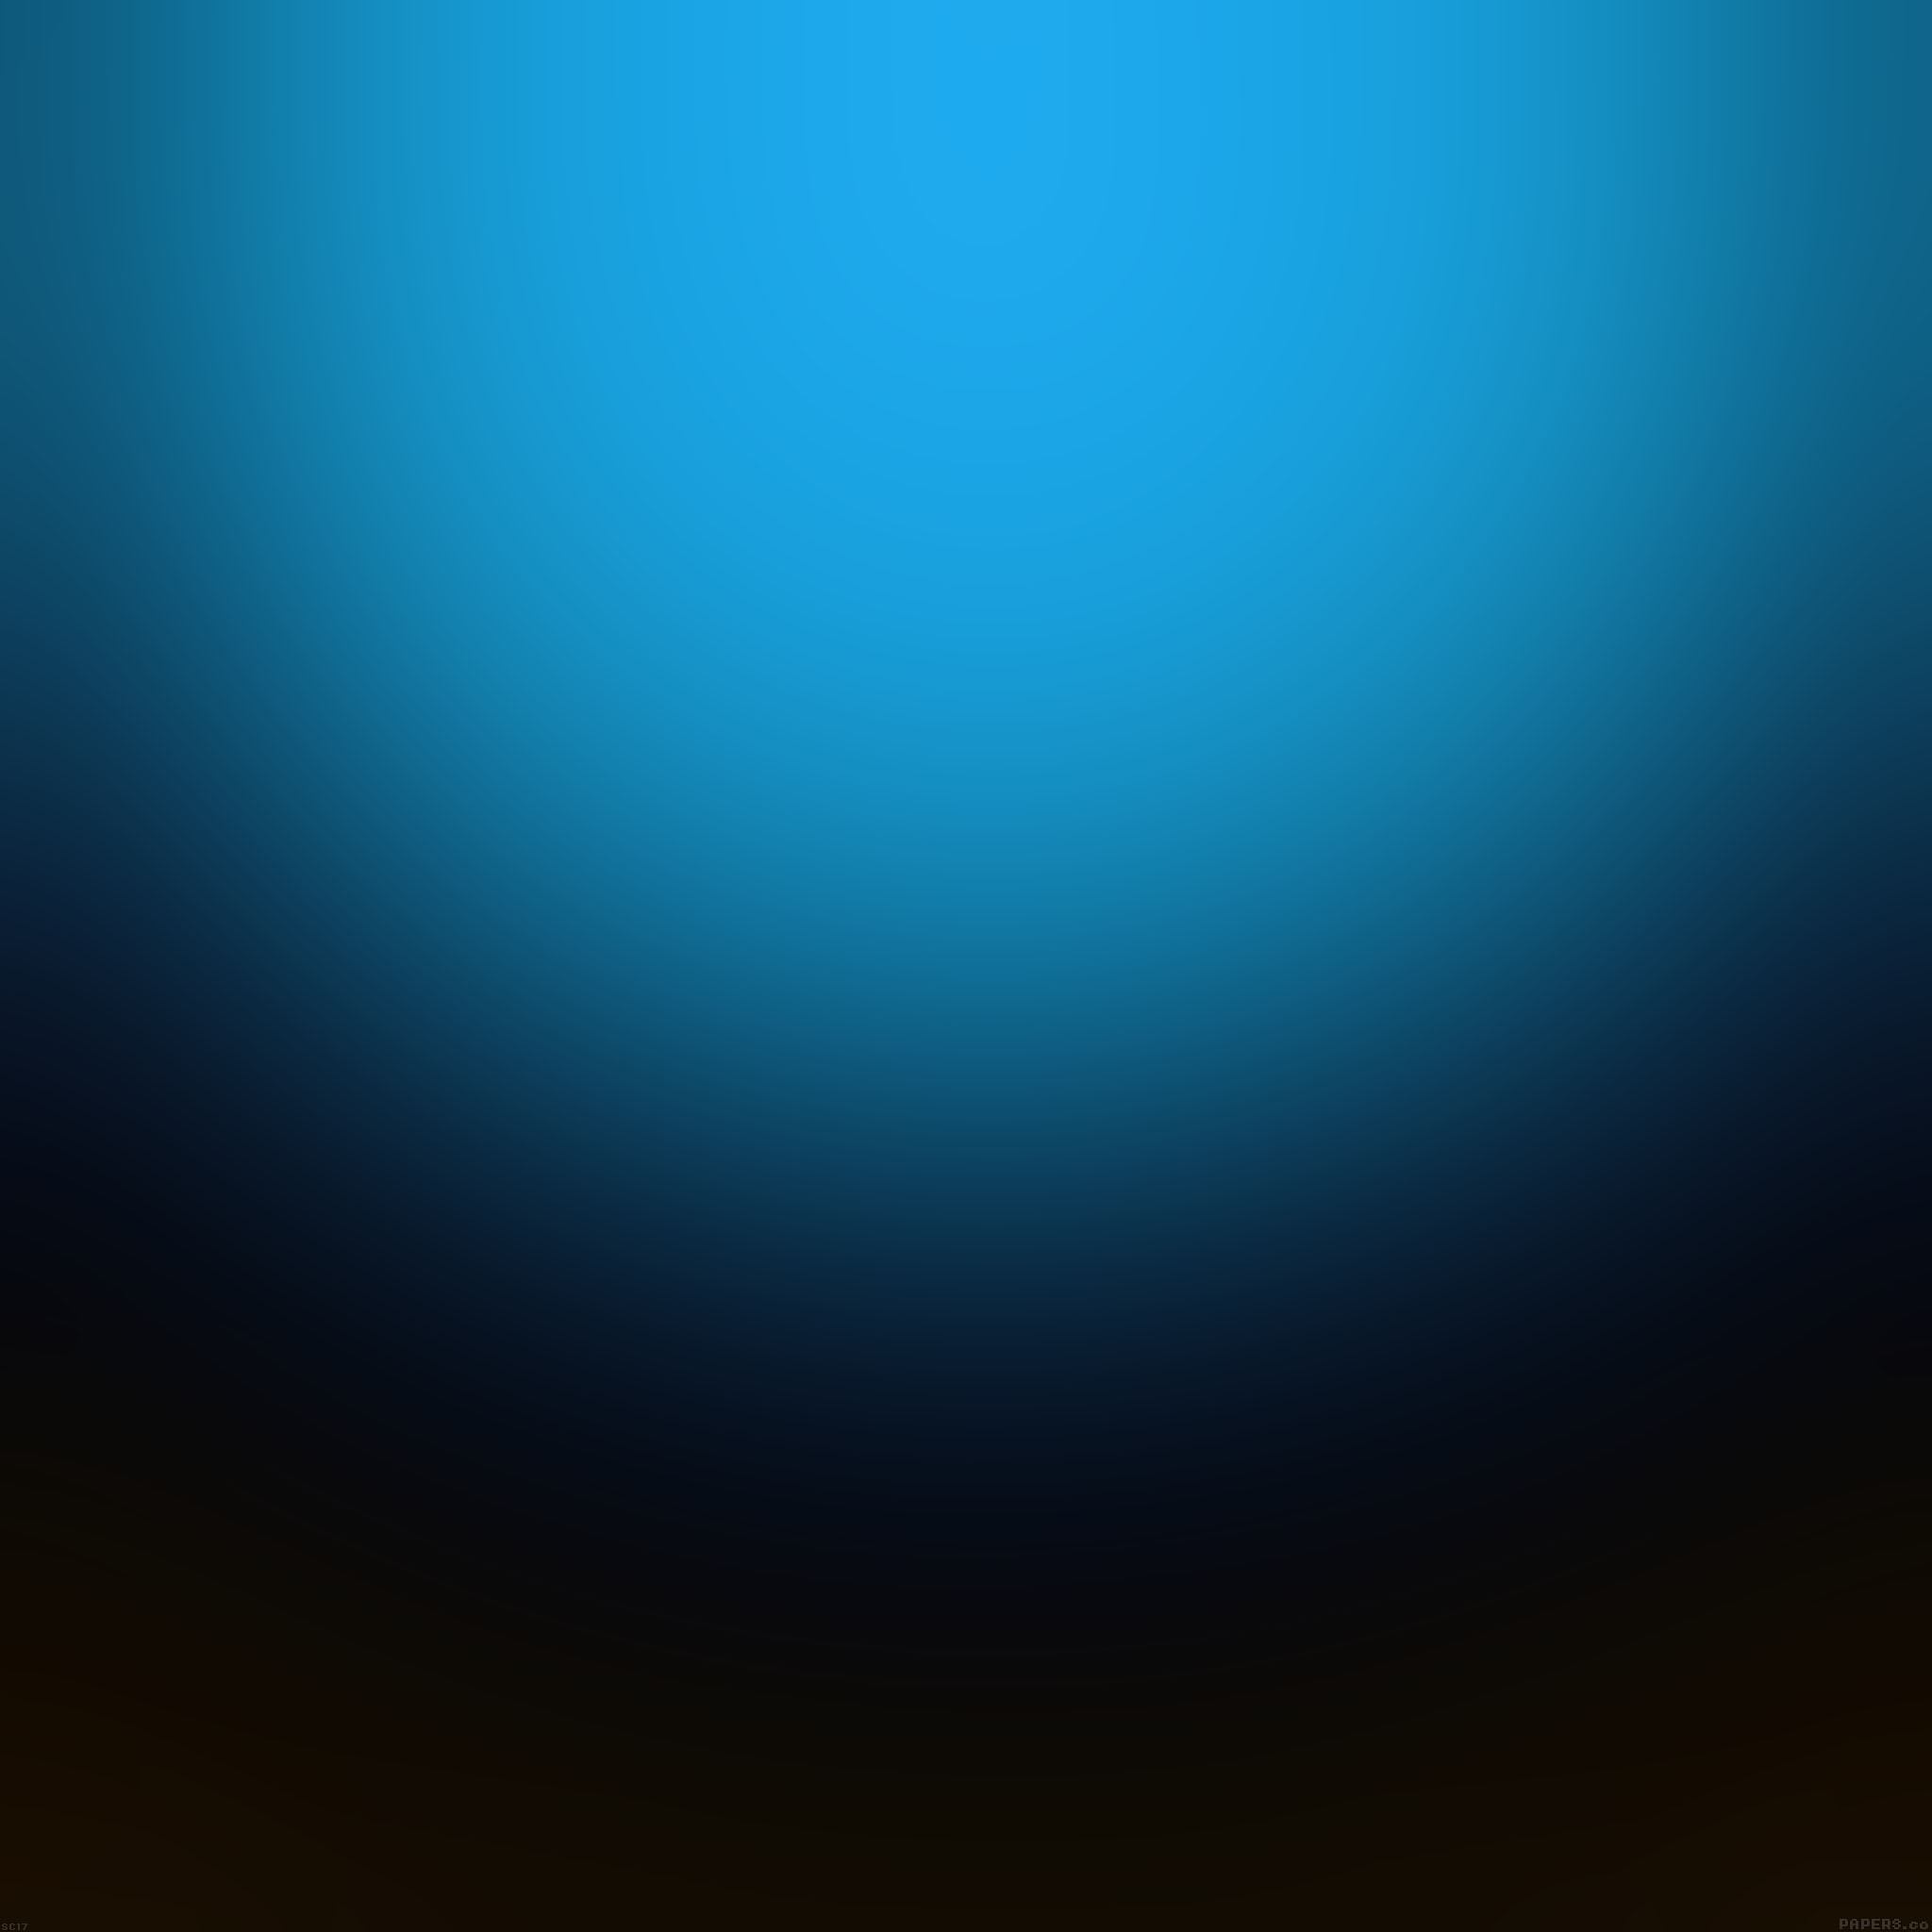 deep water Amazoncom: deep water: yael stone, noah taylor, jeremy lindsay taylor, danielle cormack, ben oxenbould, dan spielman, craig mclachlan, william mcinnes, shawn seet.